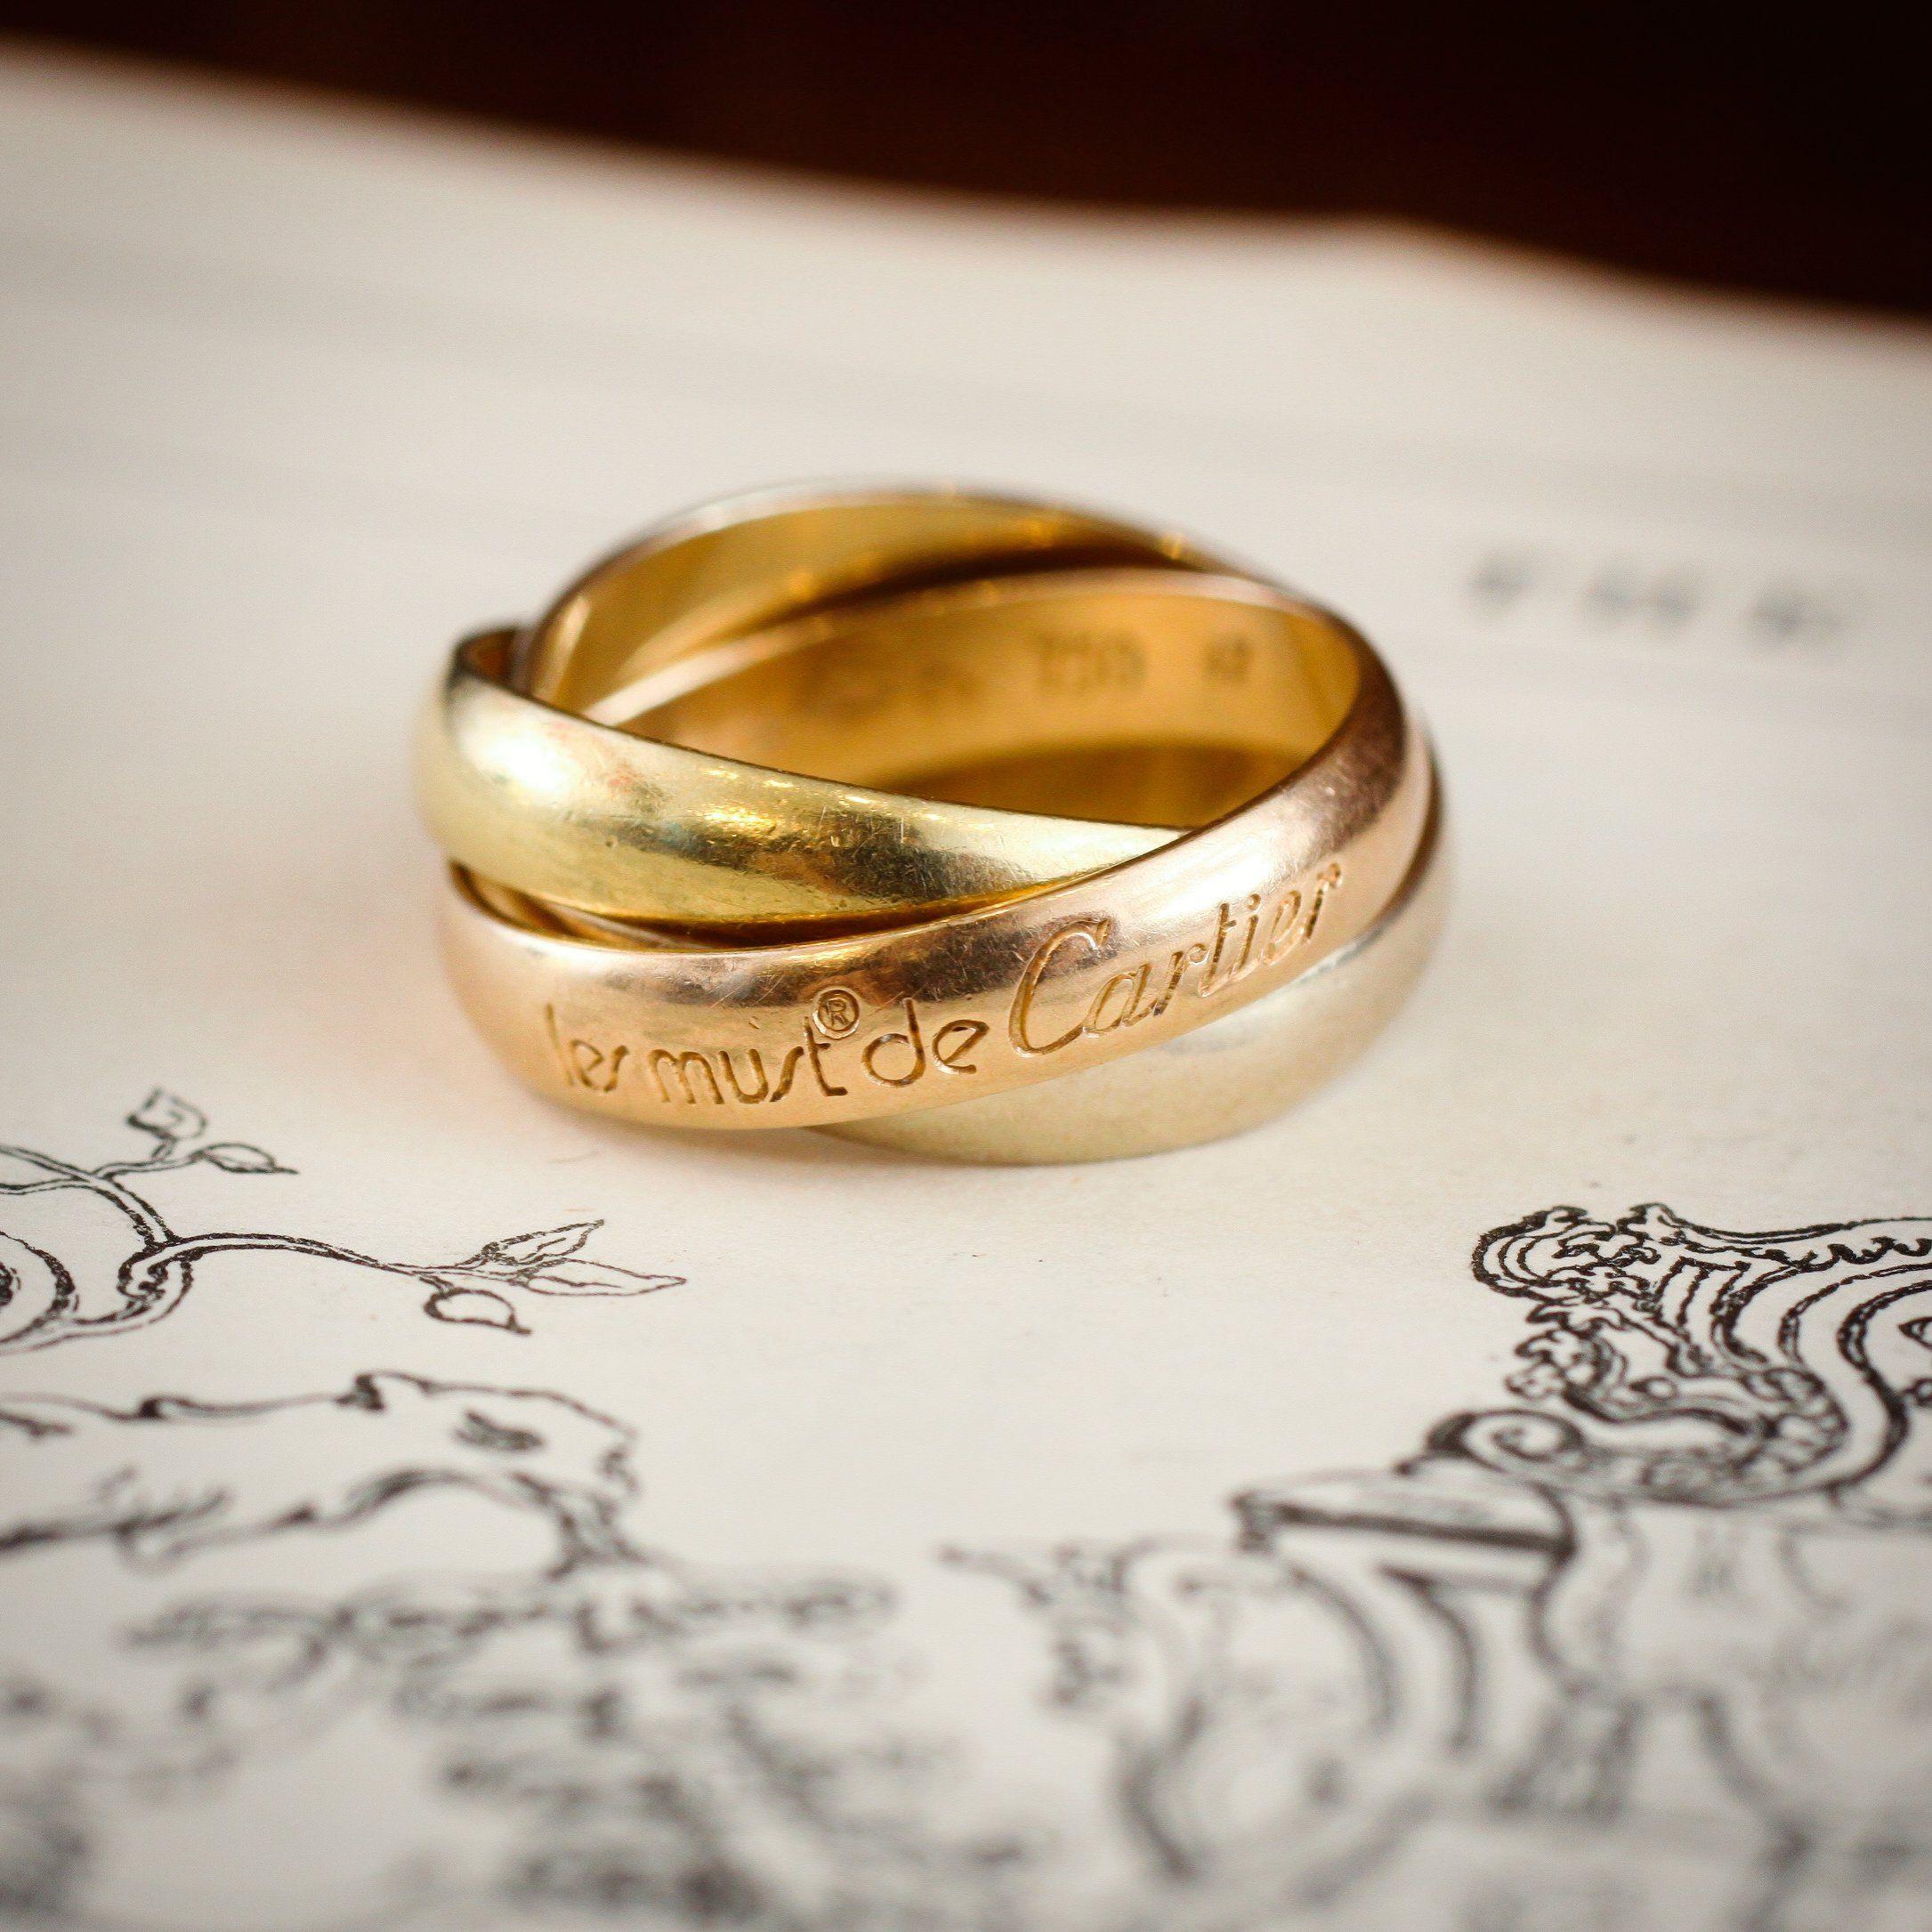 Les must de cartier trinity russian wedding ring